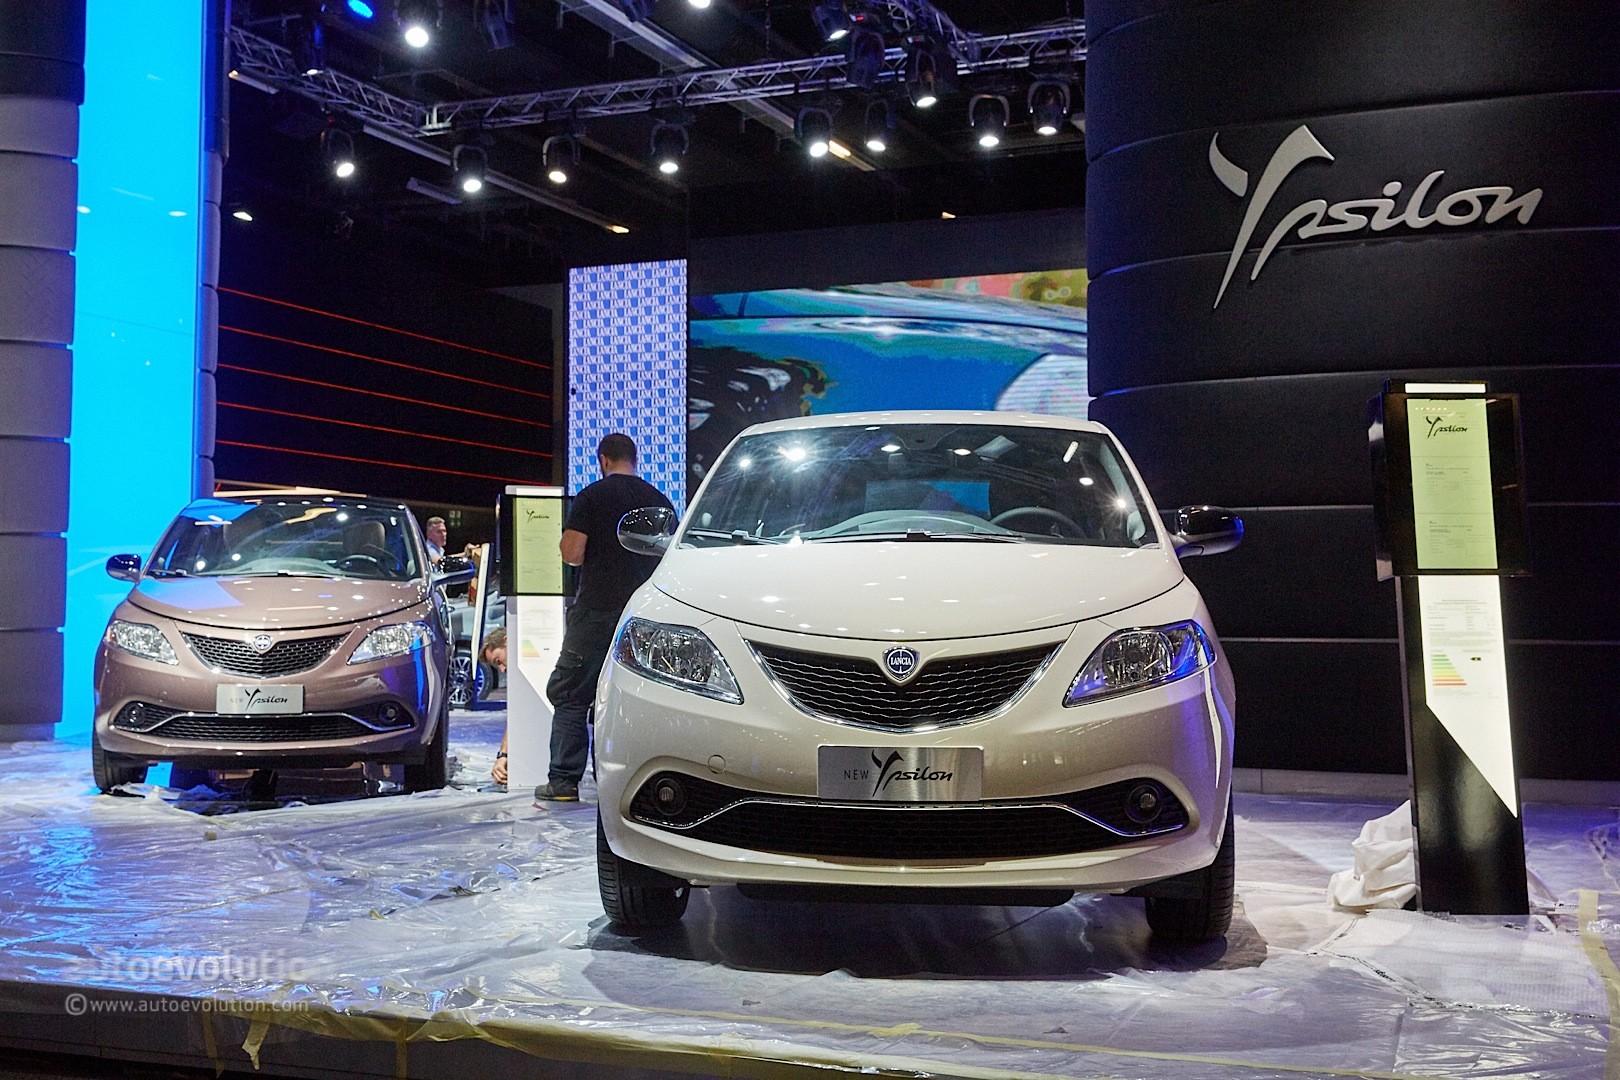 2015 - [Lancia] Ypsilon restylée - Page 5 Lancia-ypsilon-facelift-is-the-last-mohican-at-frankfurt-2015-live-photos_4